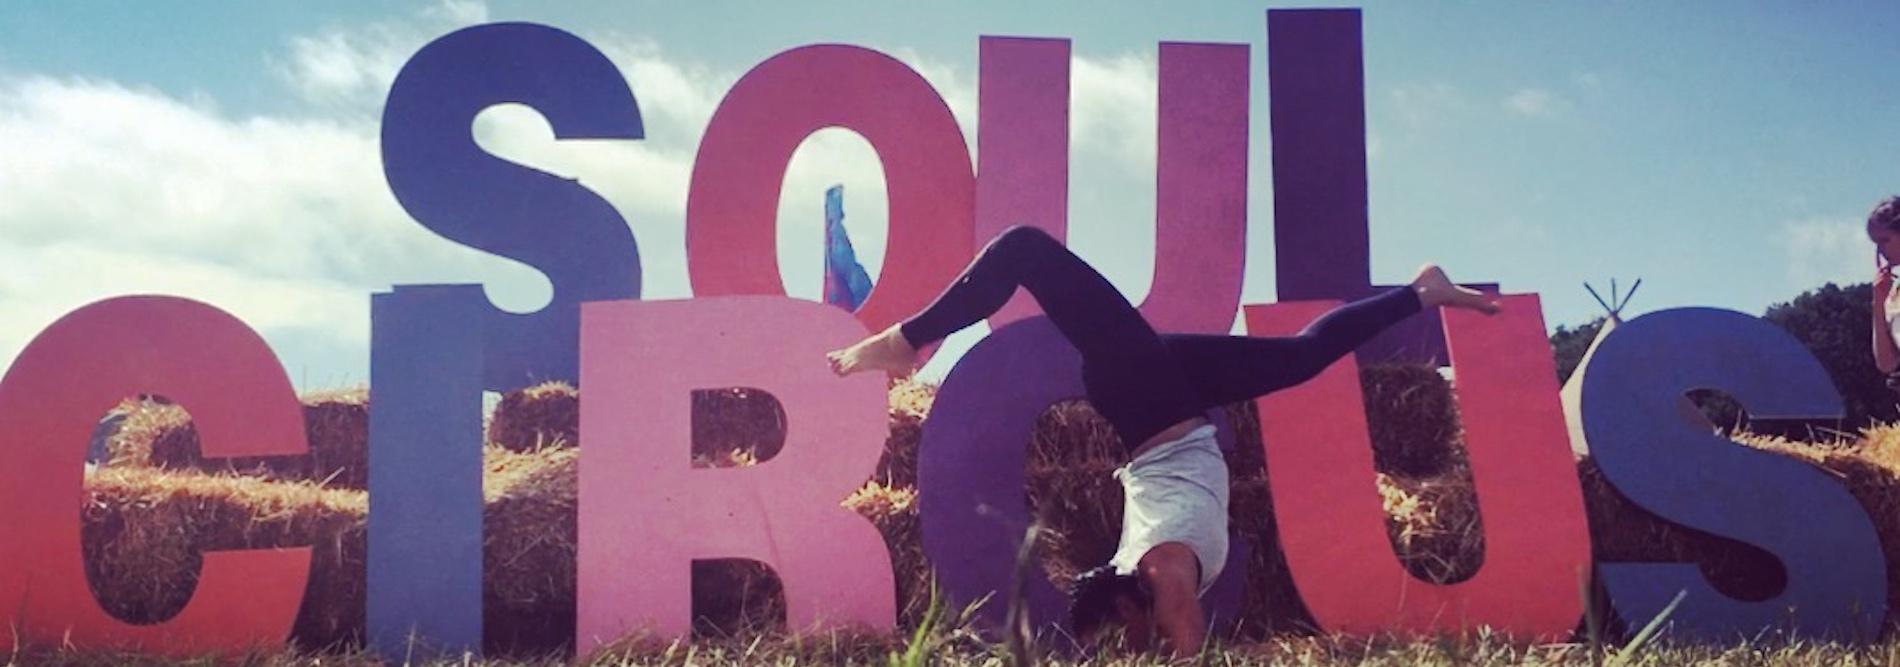 Soulcircus festival